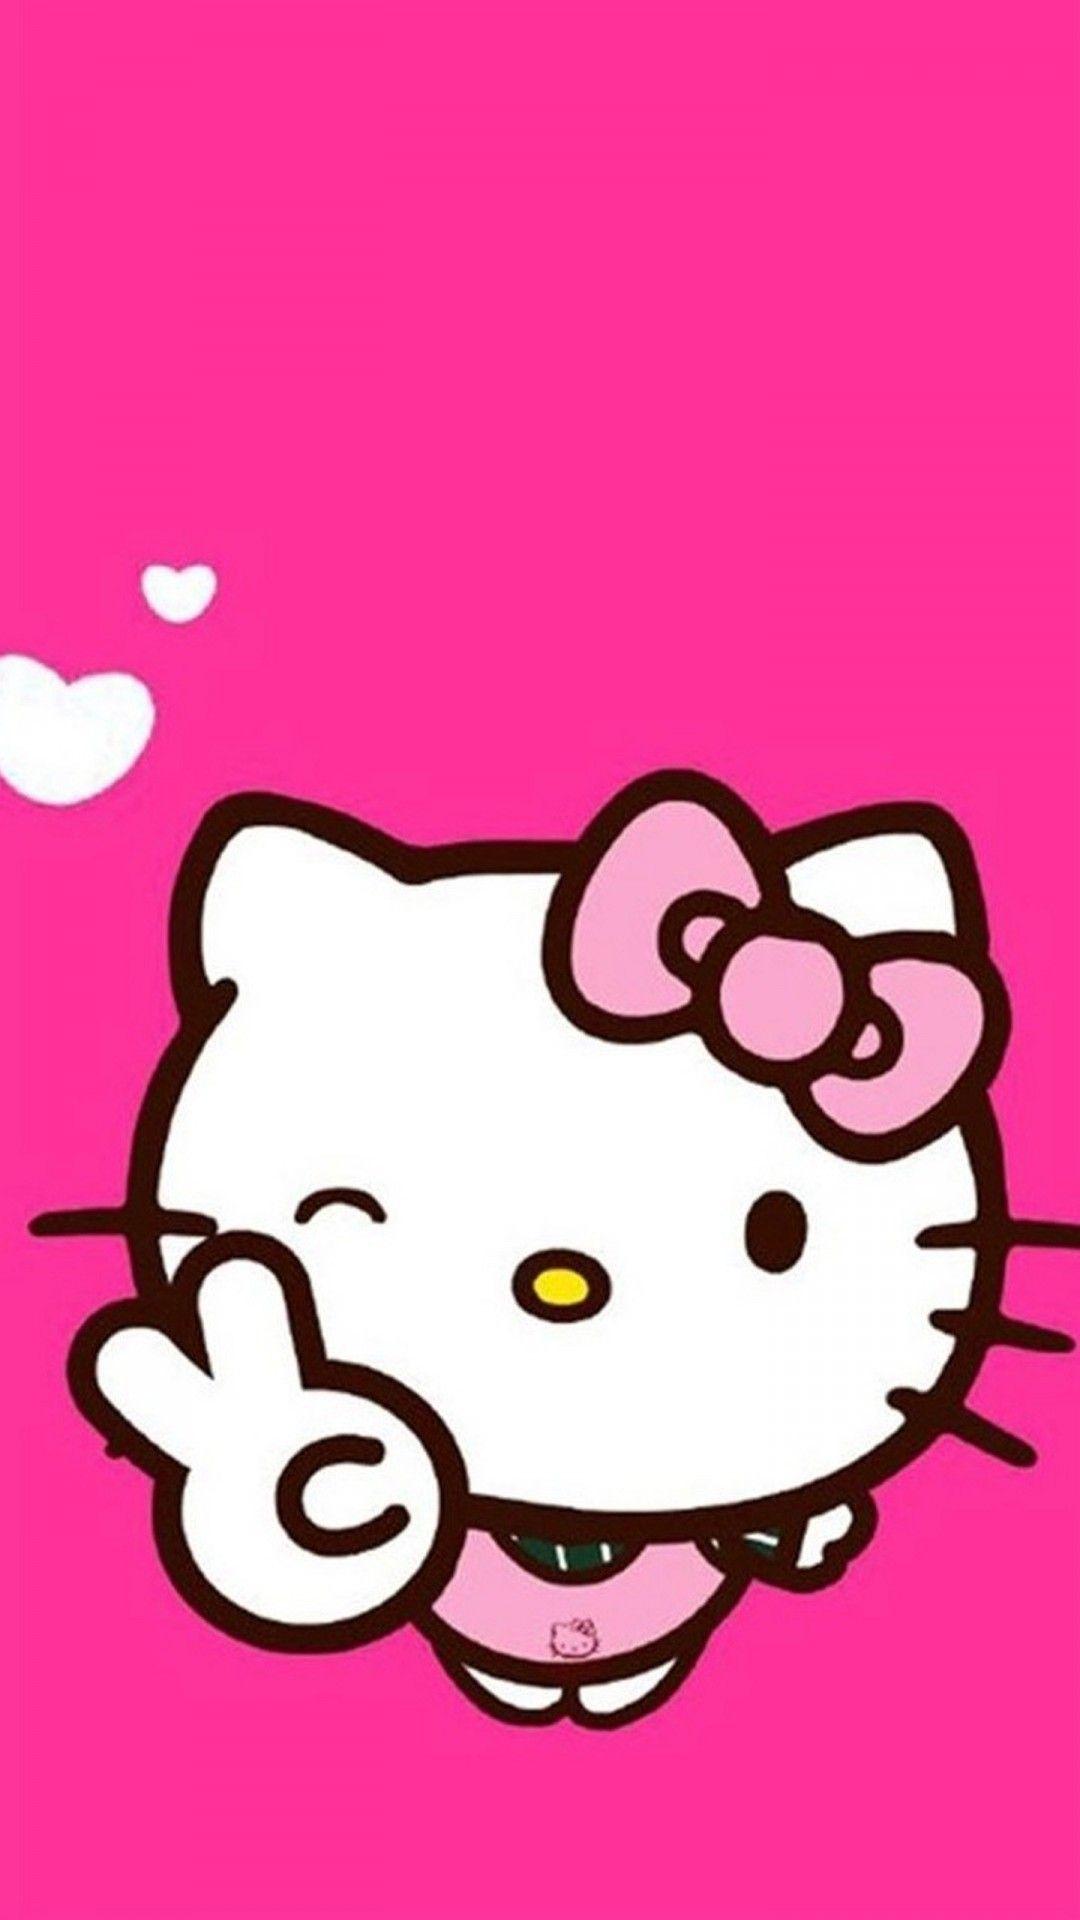 Fantastic Wallpaper Hello Kitty Punk - fb9d4af53b9f6be685309871aa8d54db  Best Photo Reference_598297.jpg